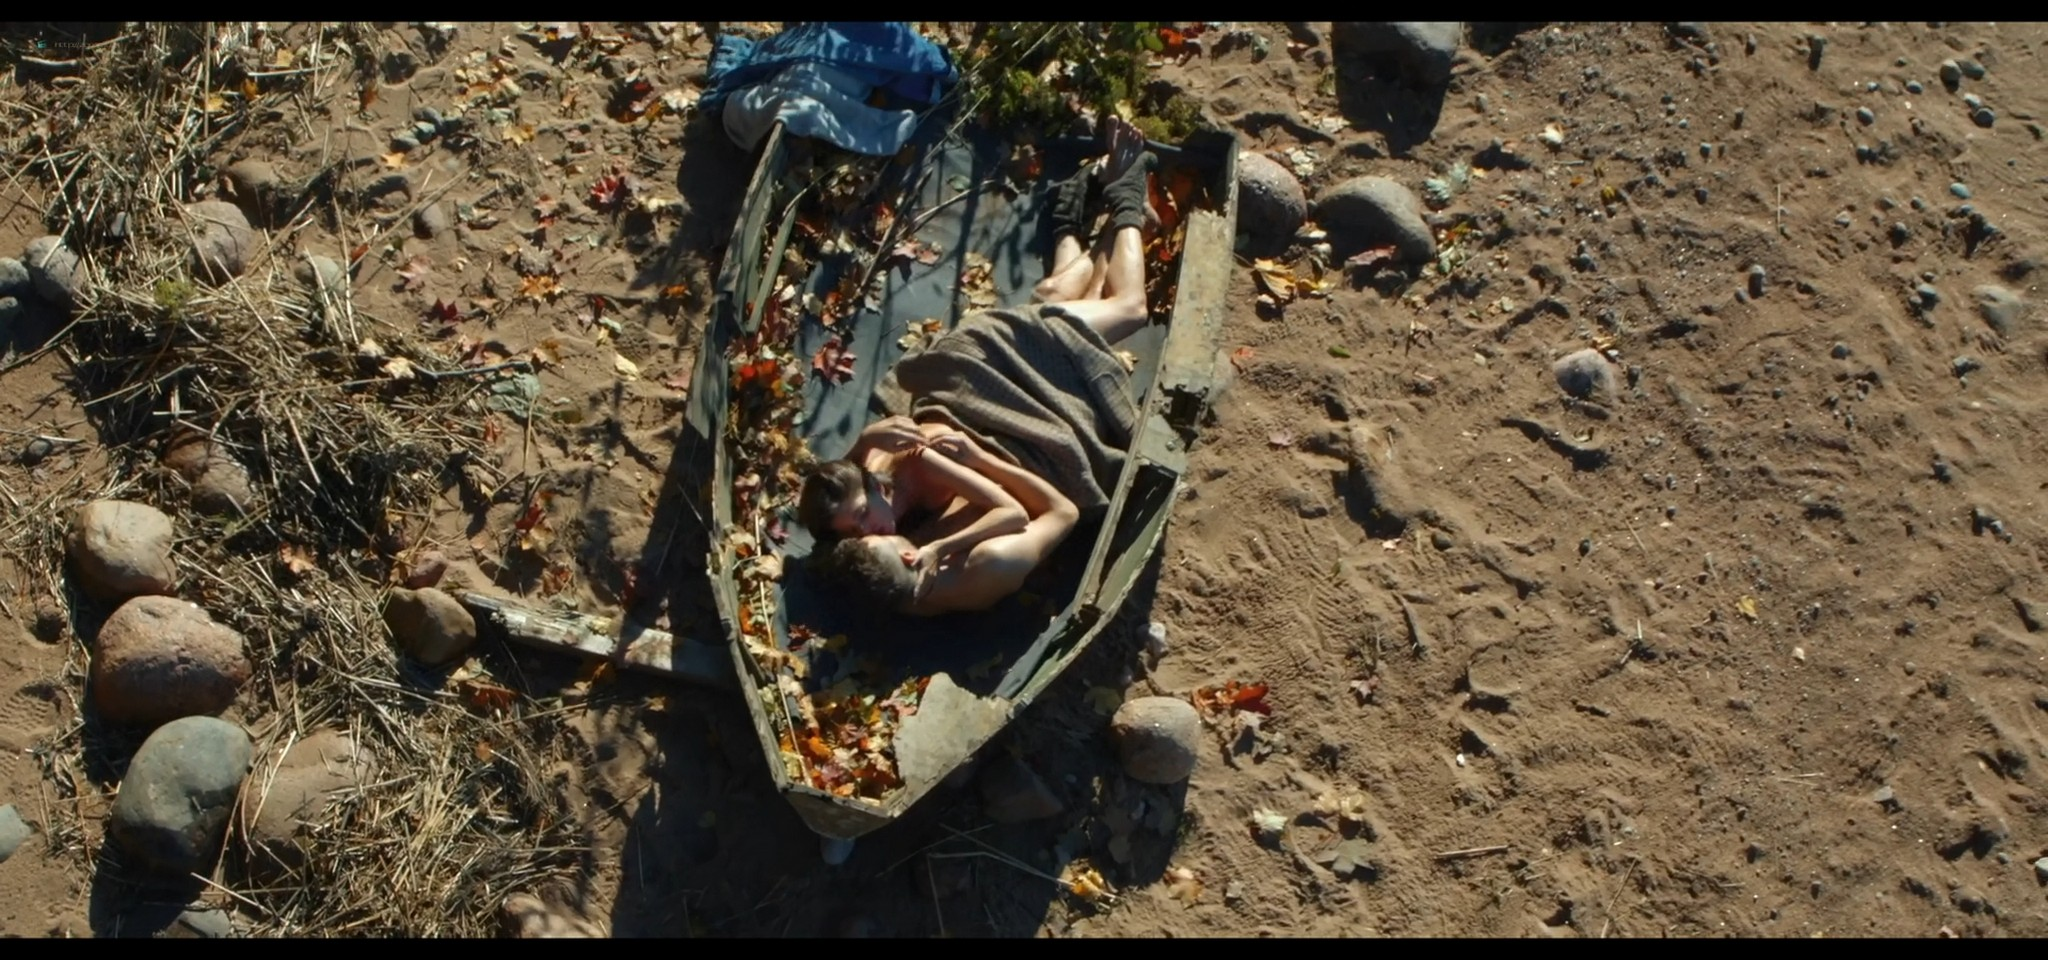 Yulia Snigir hot and some sex Anna Chipovskaya, Yuliya Peresild sexy - The End of the Season (2019) HD 1080p Web (2)